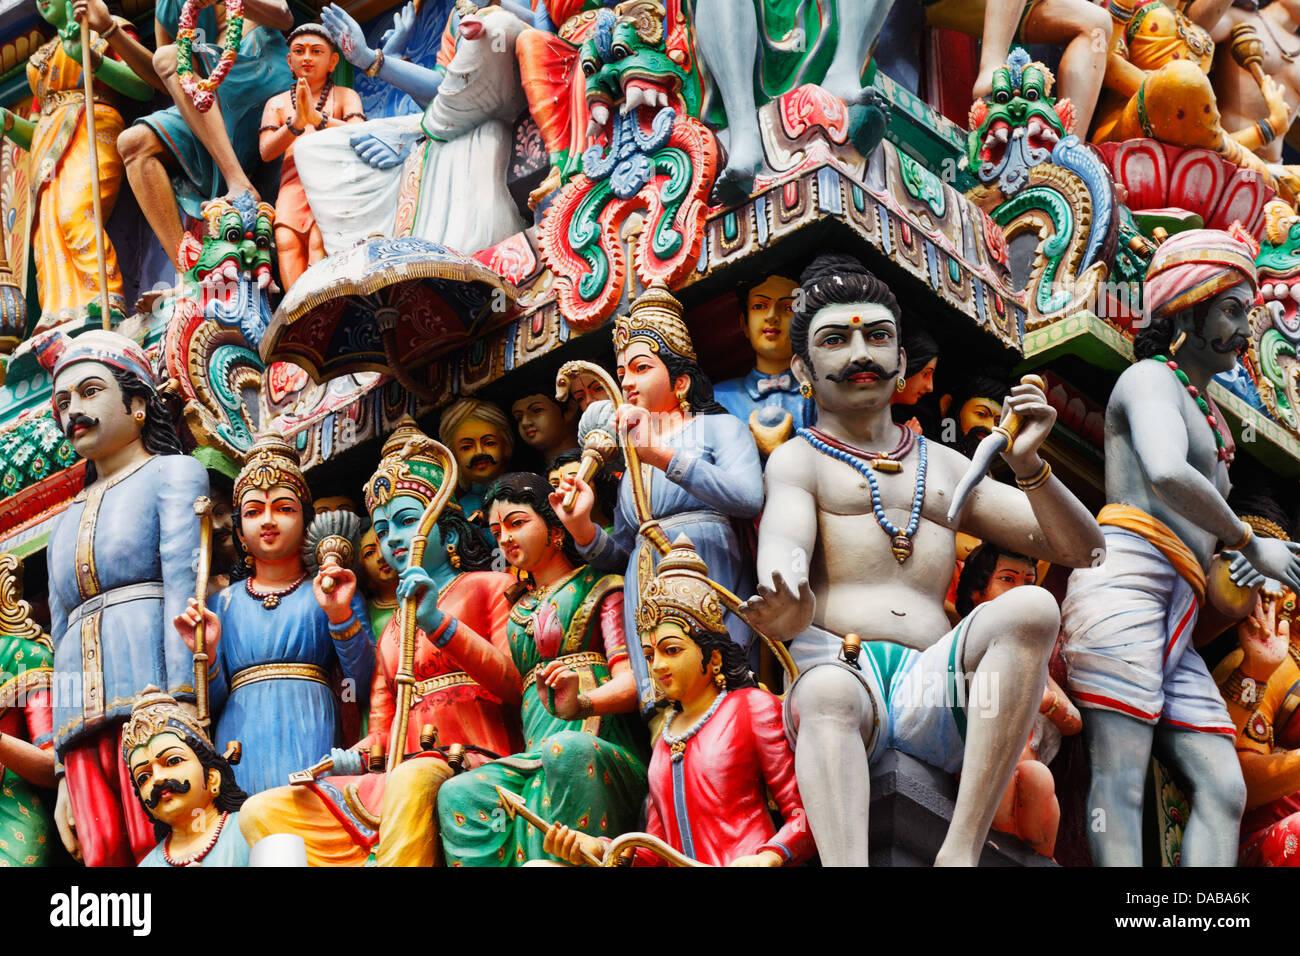 Sri Mariammam temple, Singapore, Asia - Stock Image